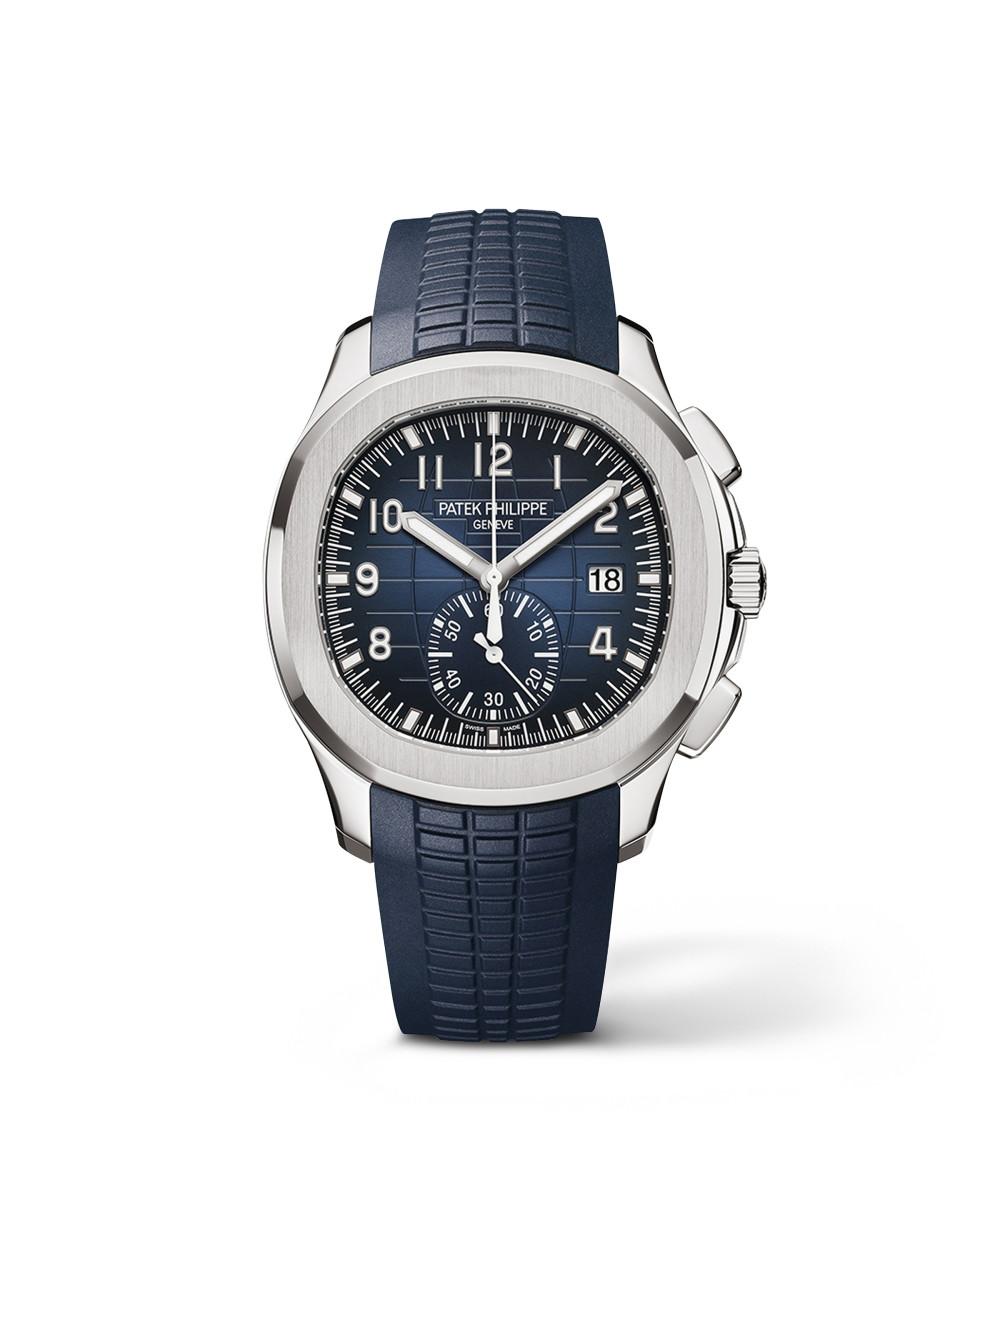 Aquanaut Herren - 5968G-001 01